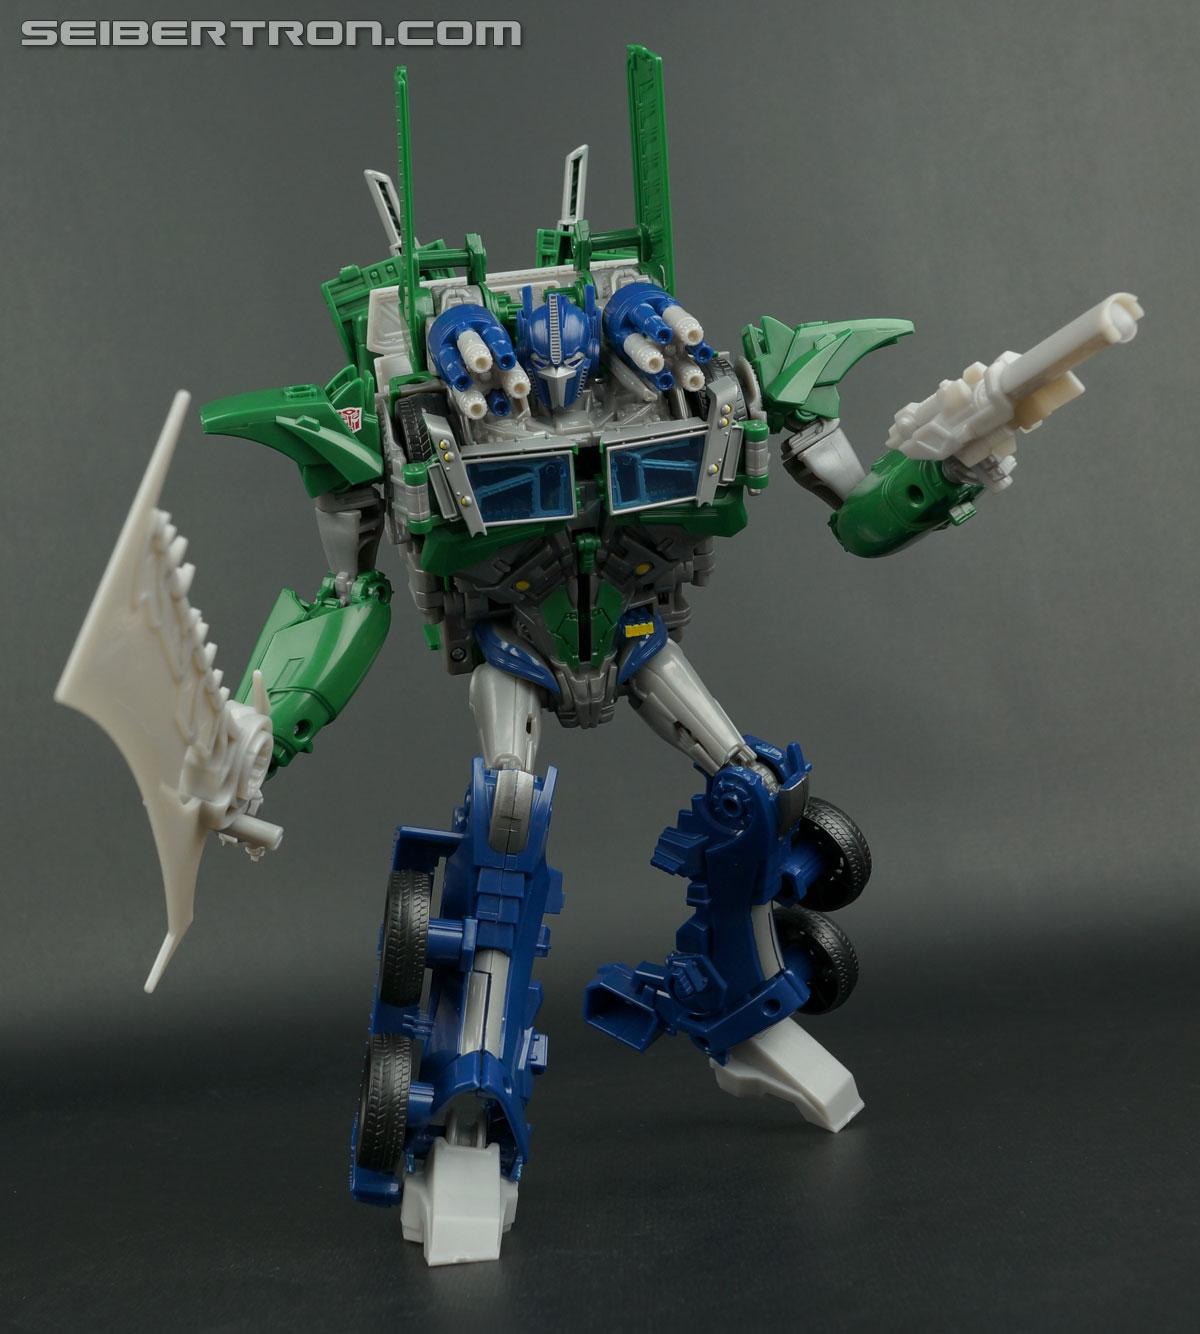 Transformers Prime Beast Hunters Beast Tracker Optimus Prime (Image #129 of 179)